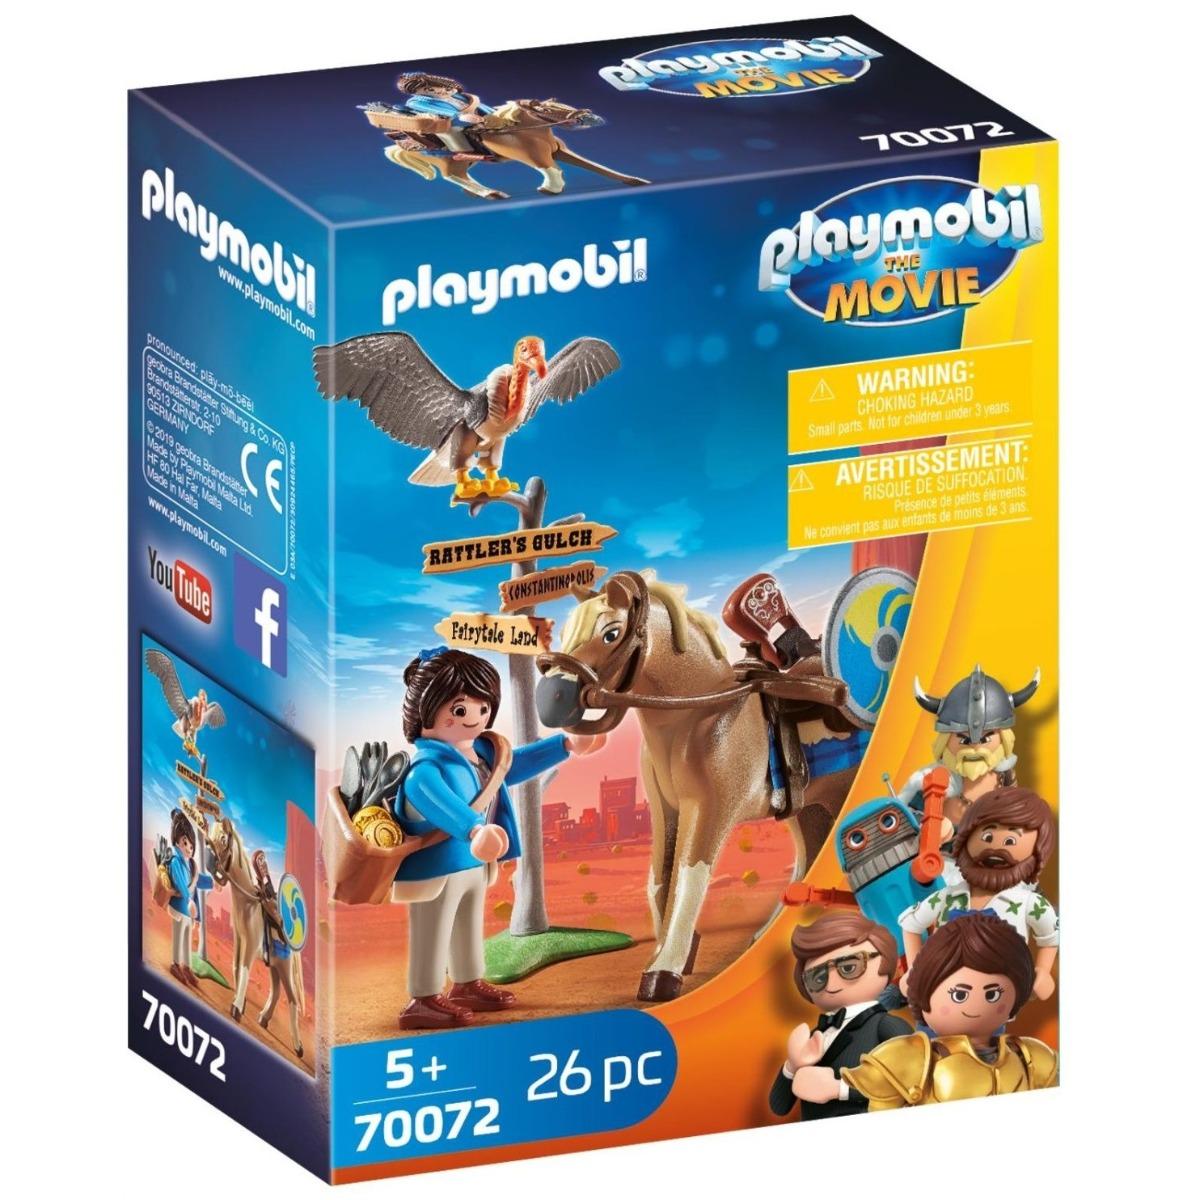 Playmobil PM70072 Marla Cu Cal imagine hippoland.ro